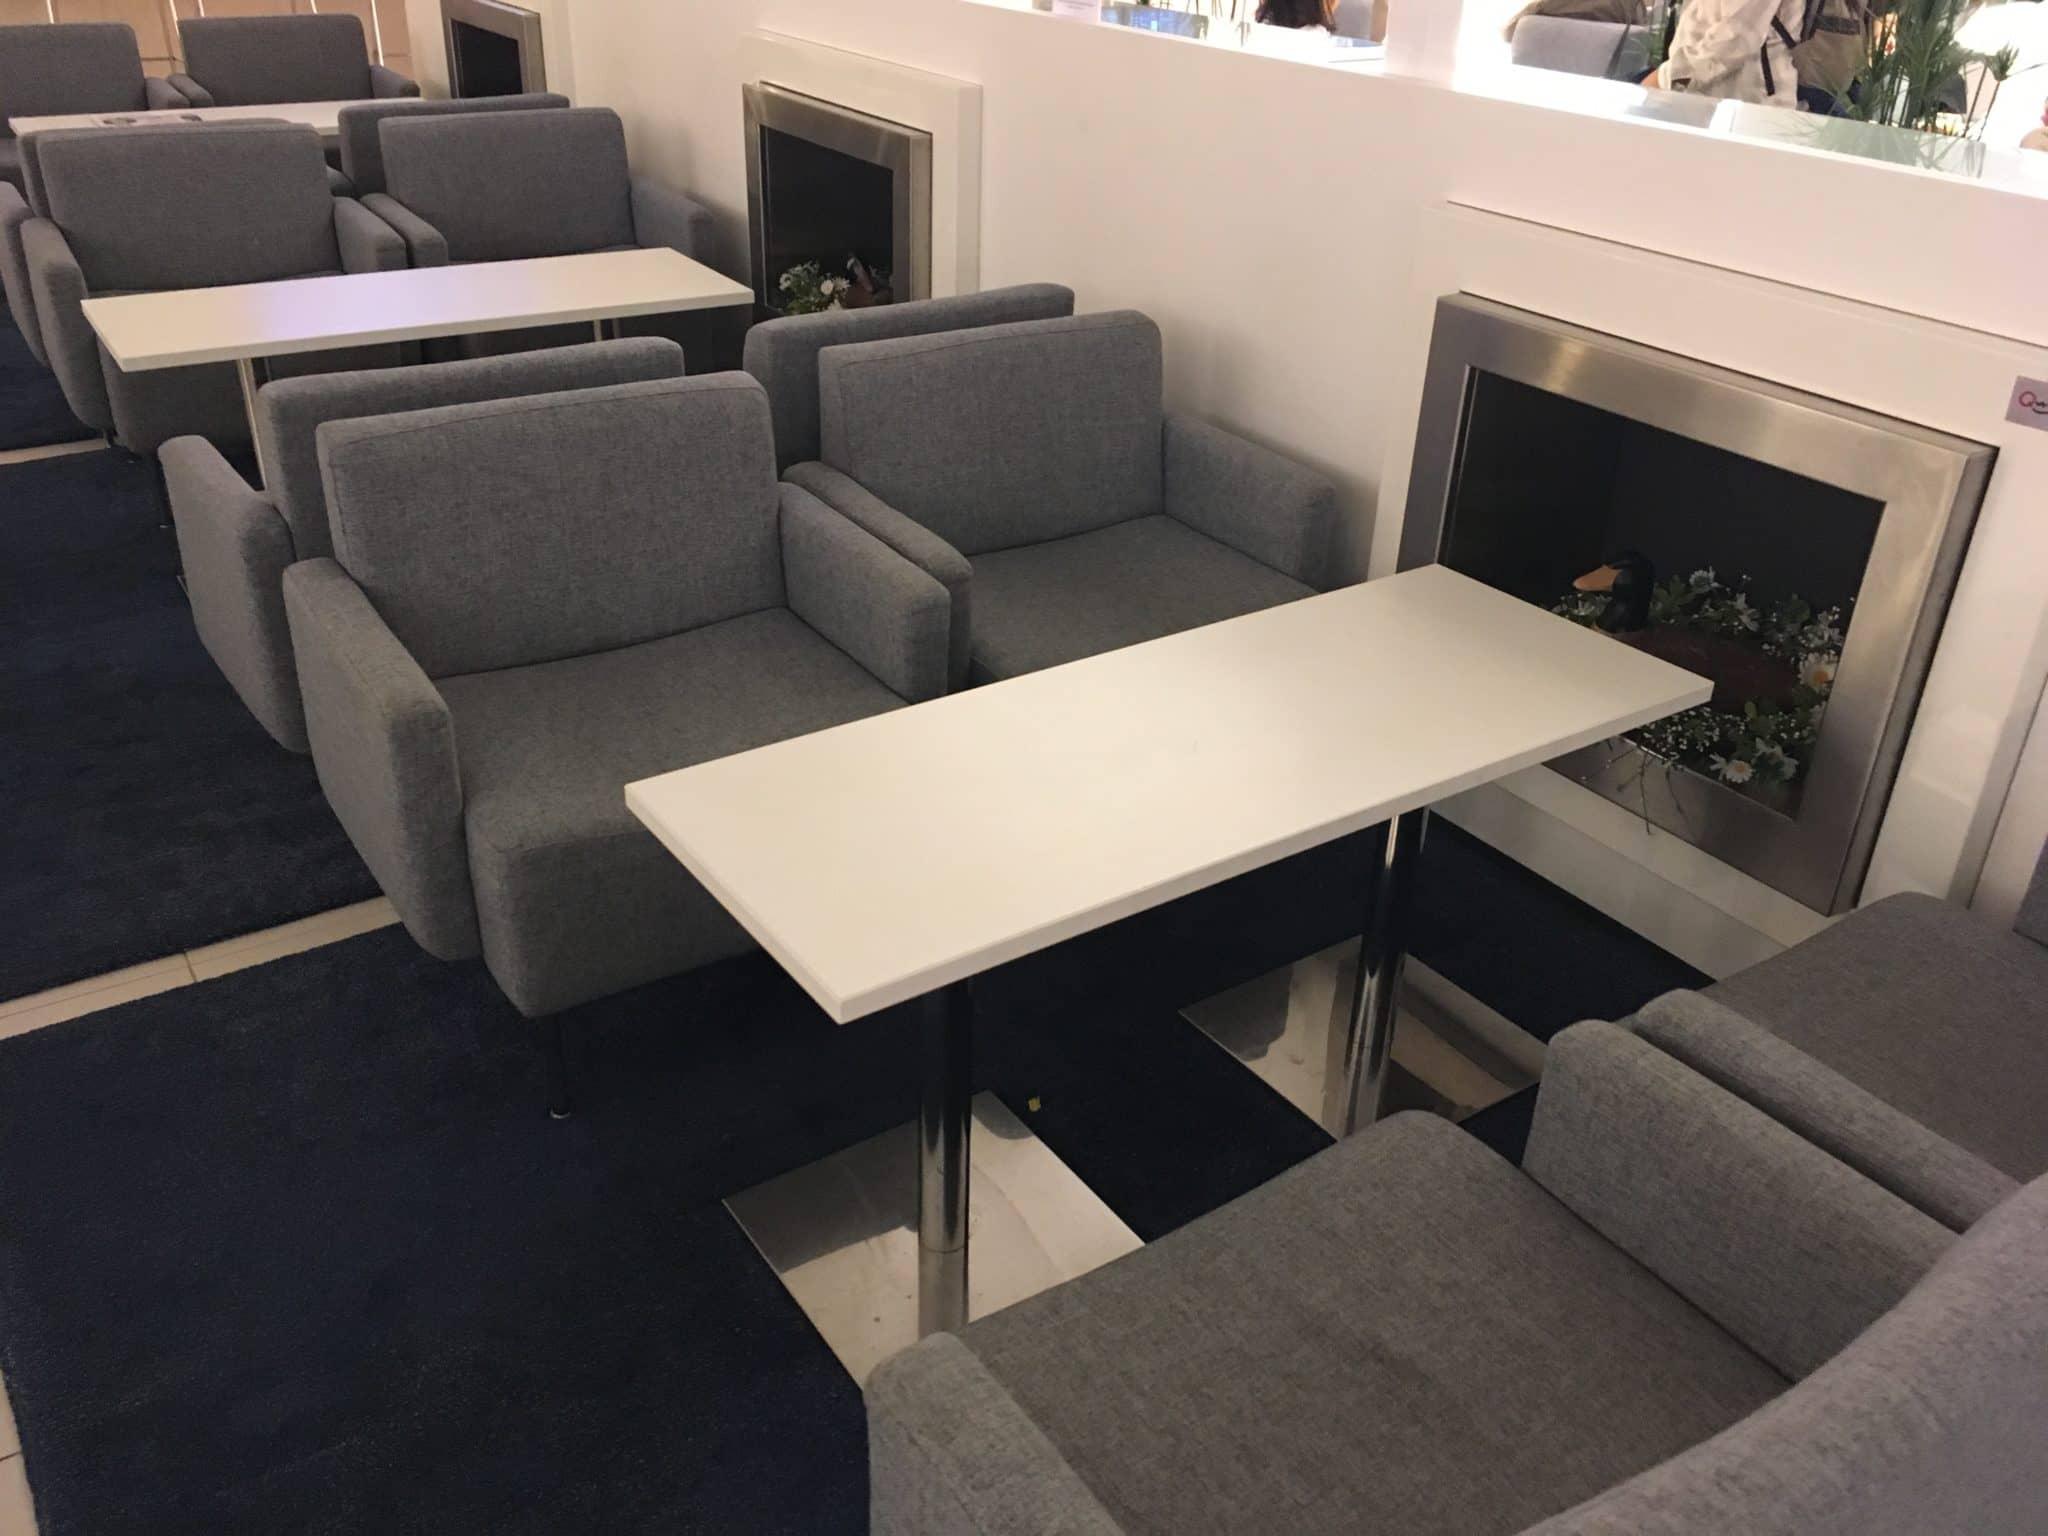 Finnair Lounge Helsinki Non-Schengen Gruppentisch